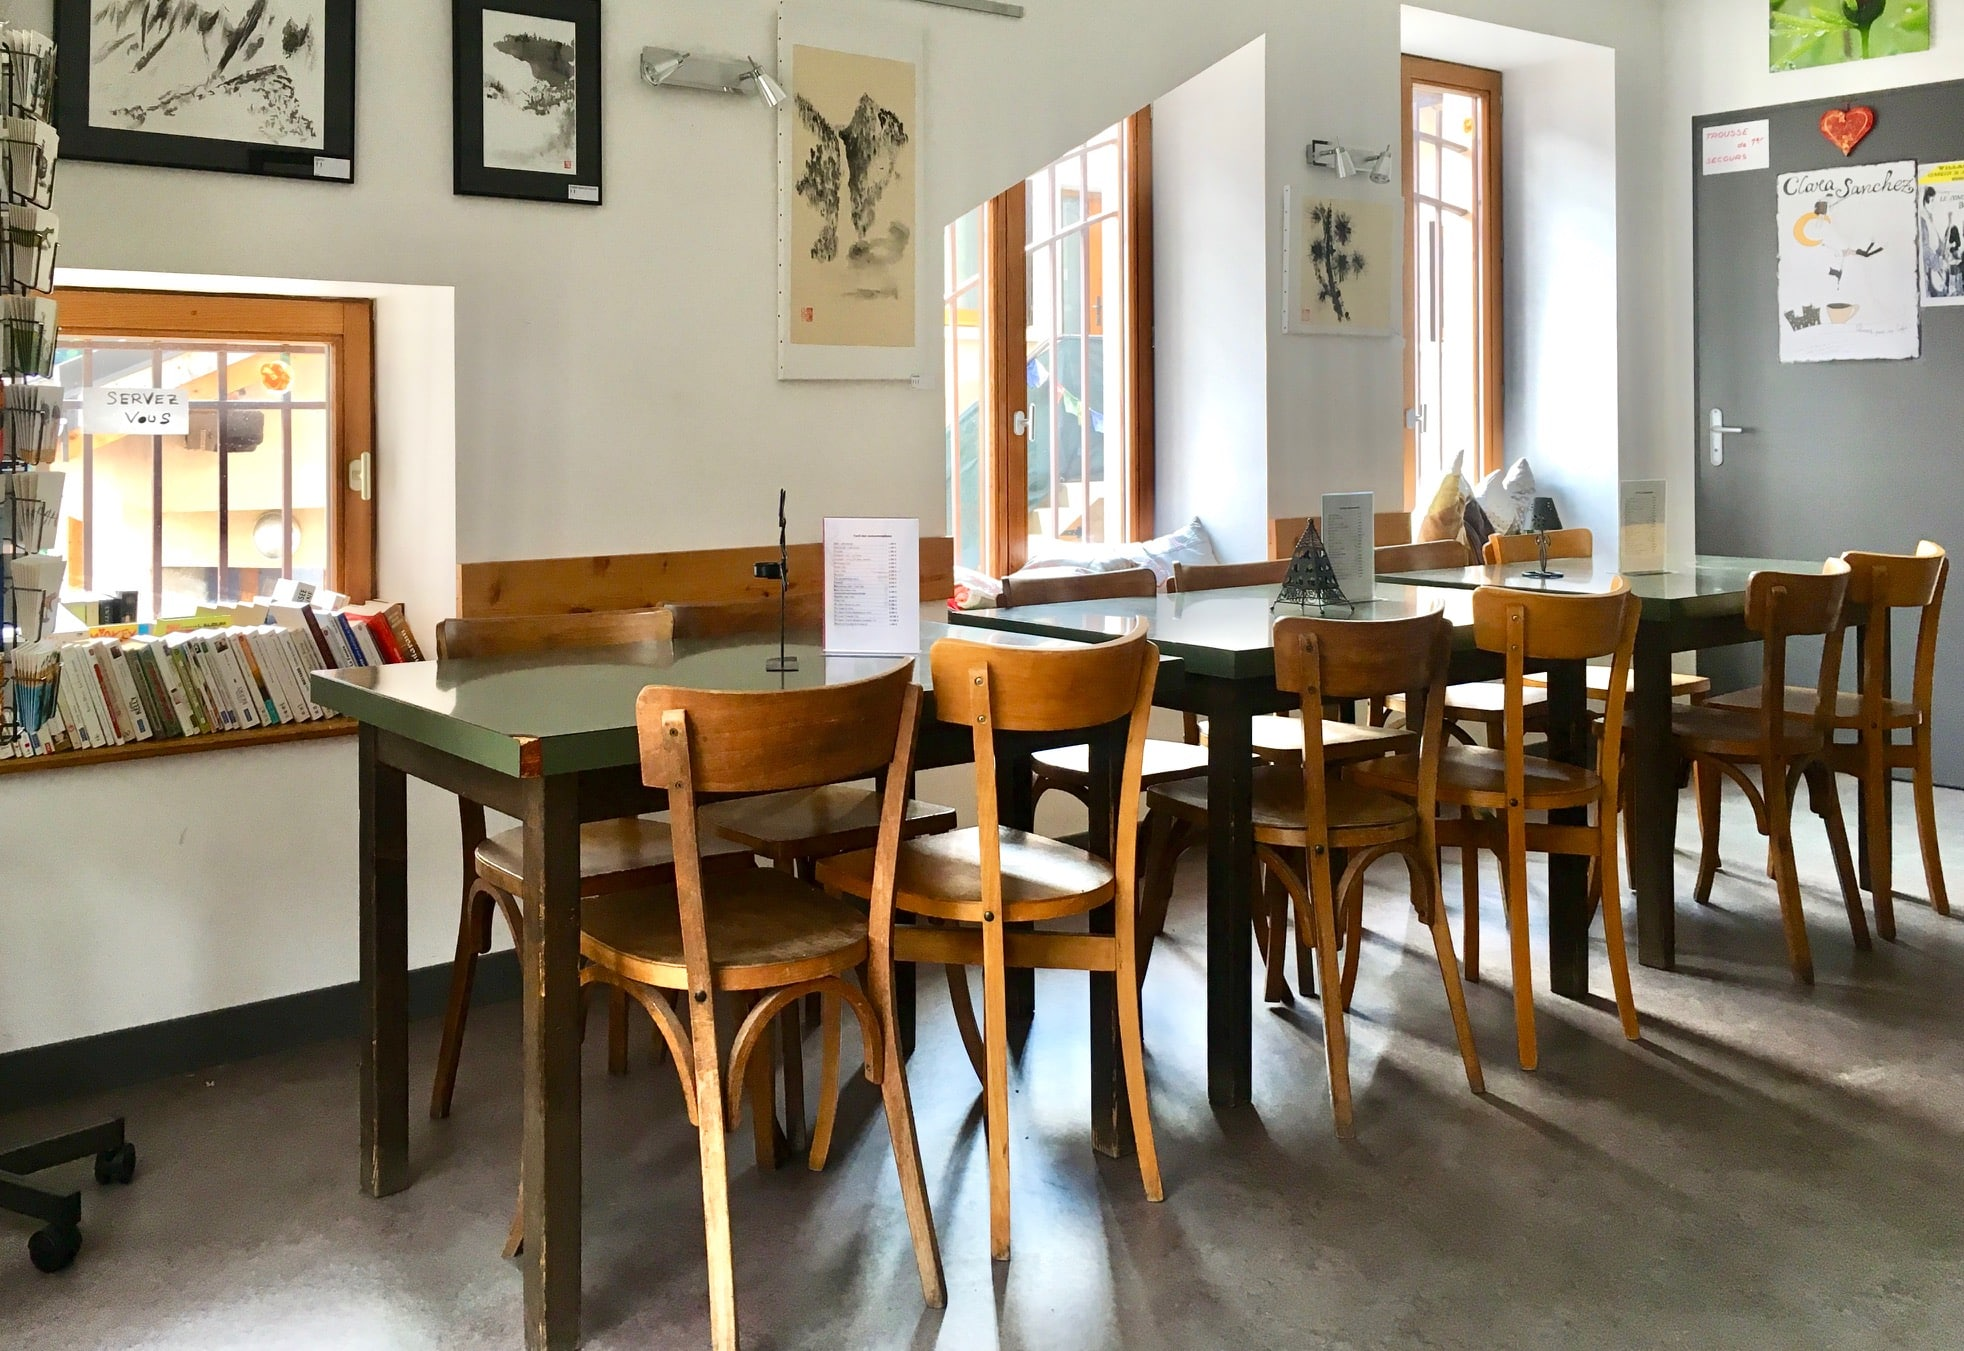 villard café interieur